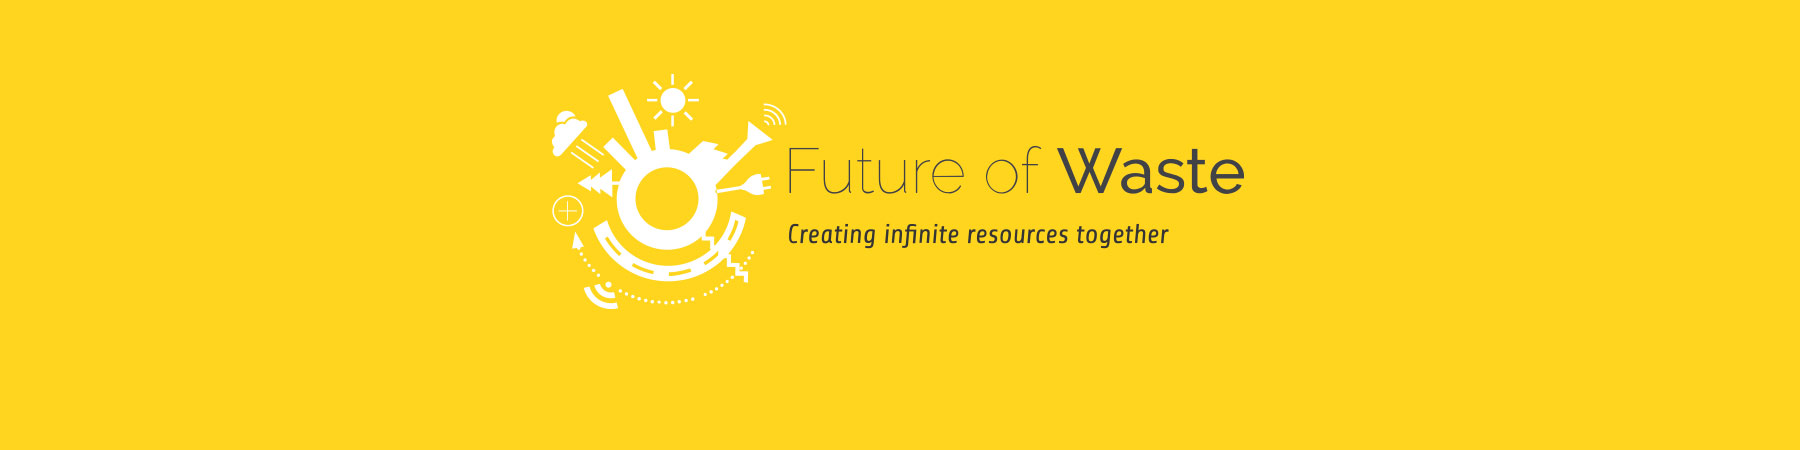 Poster   program   future of waste